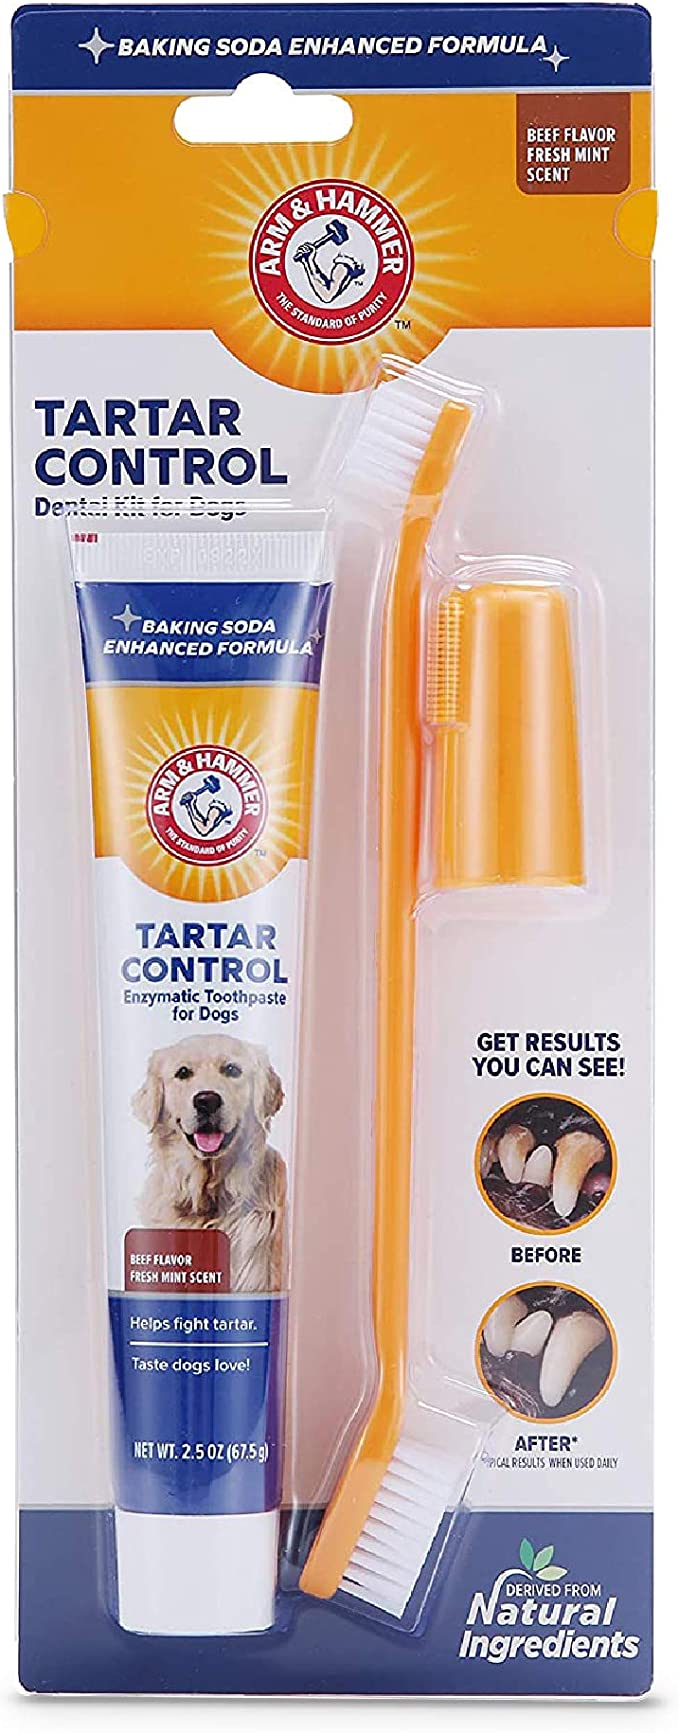 Arm & Hammer for Pets Dog Dental Care Fresh Breath Kit